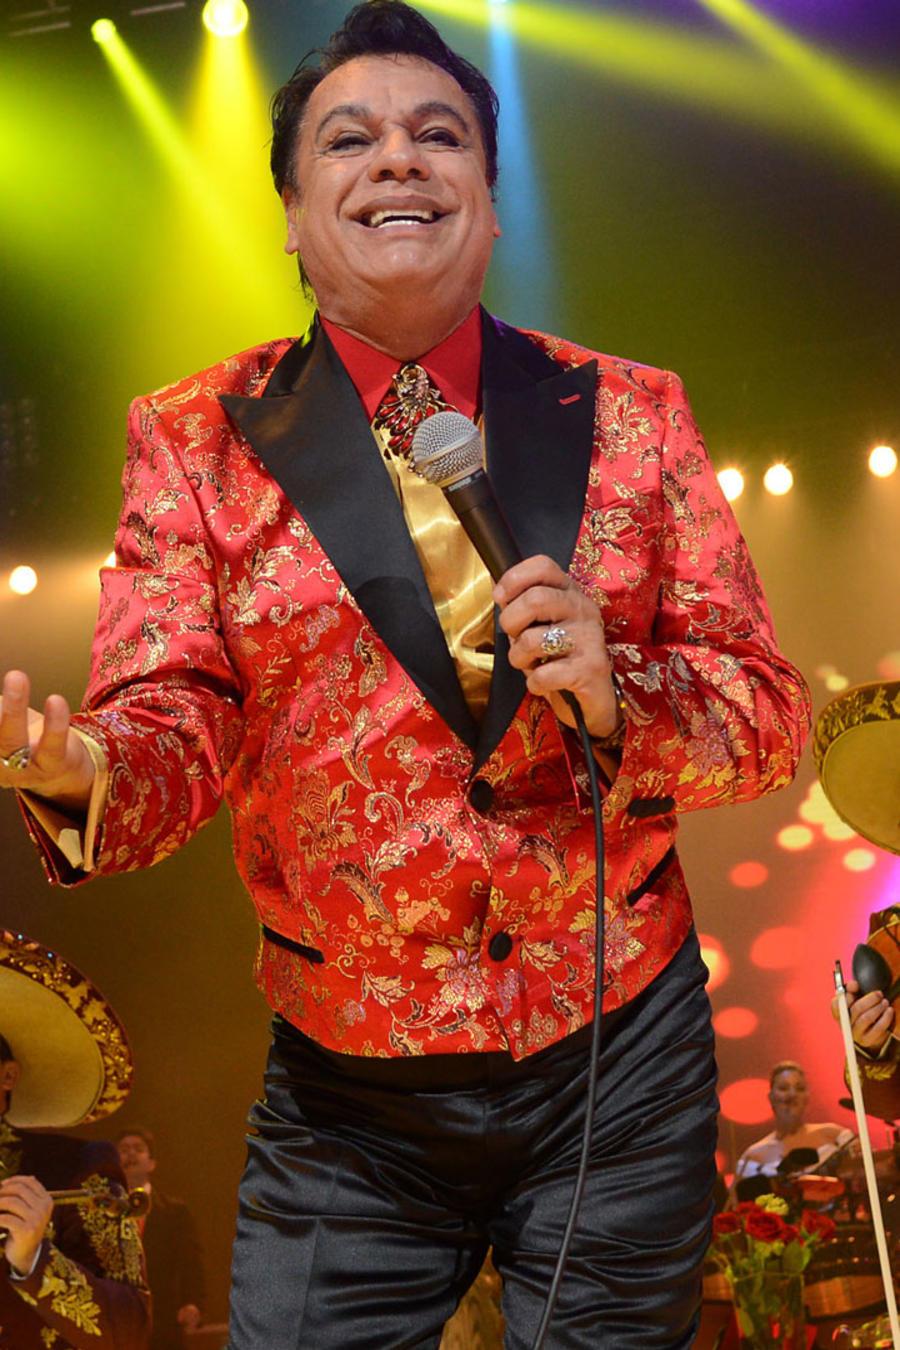 Juan Gabriel